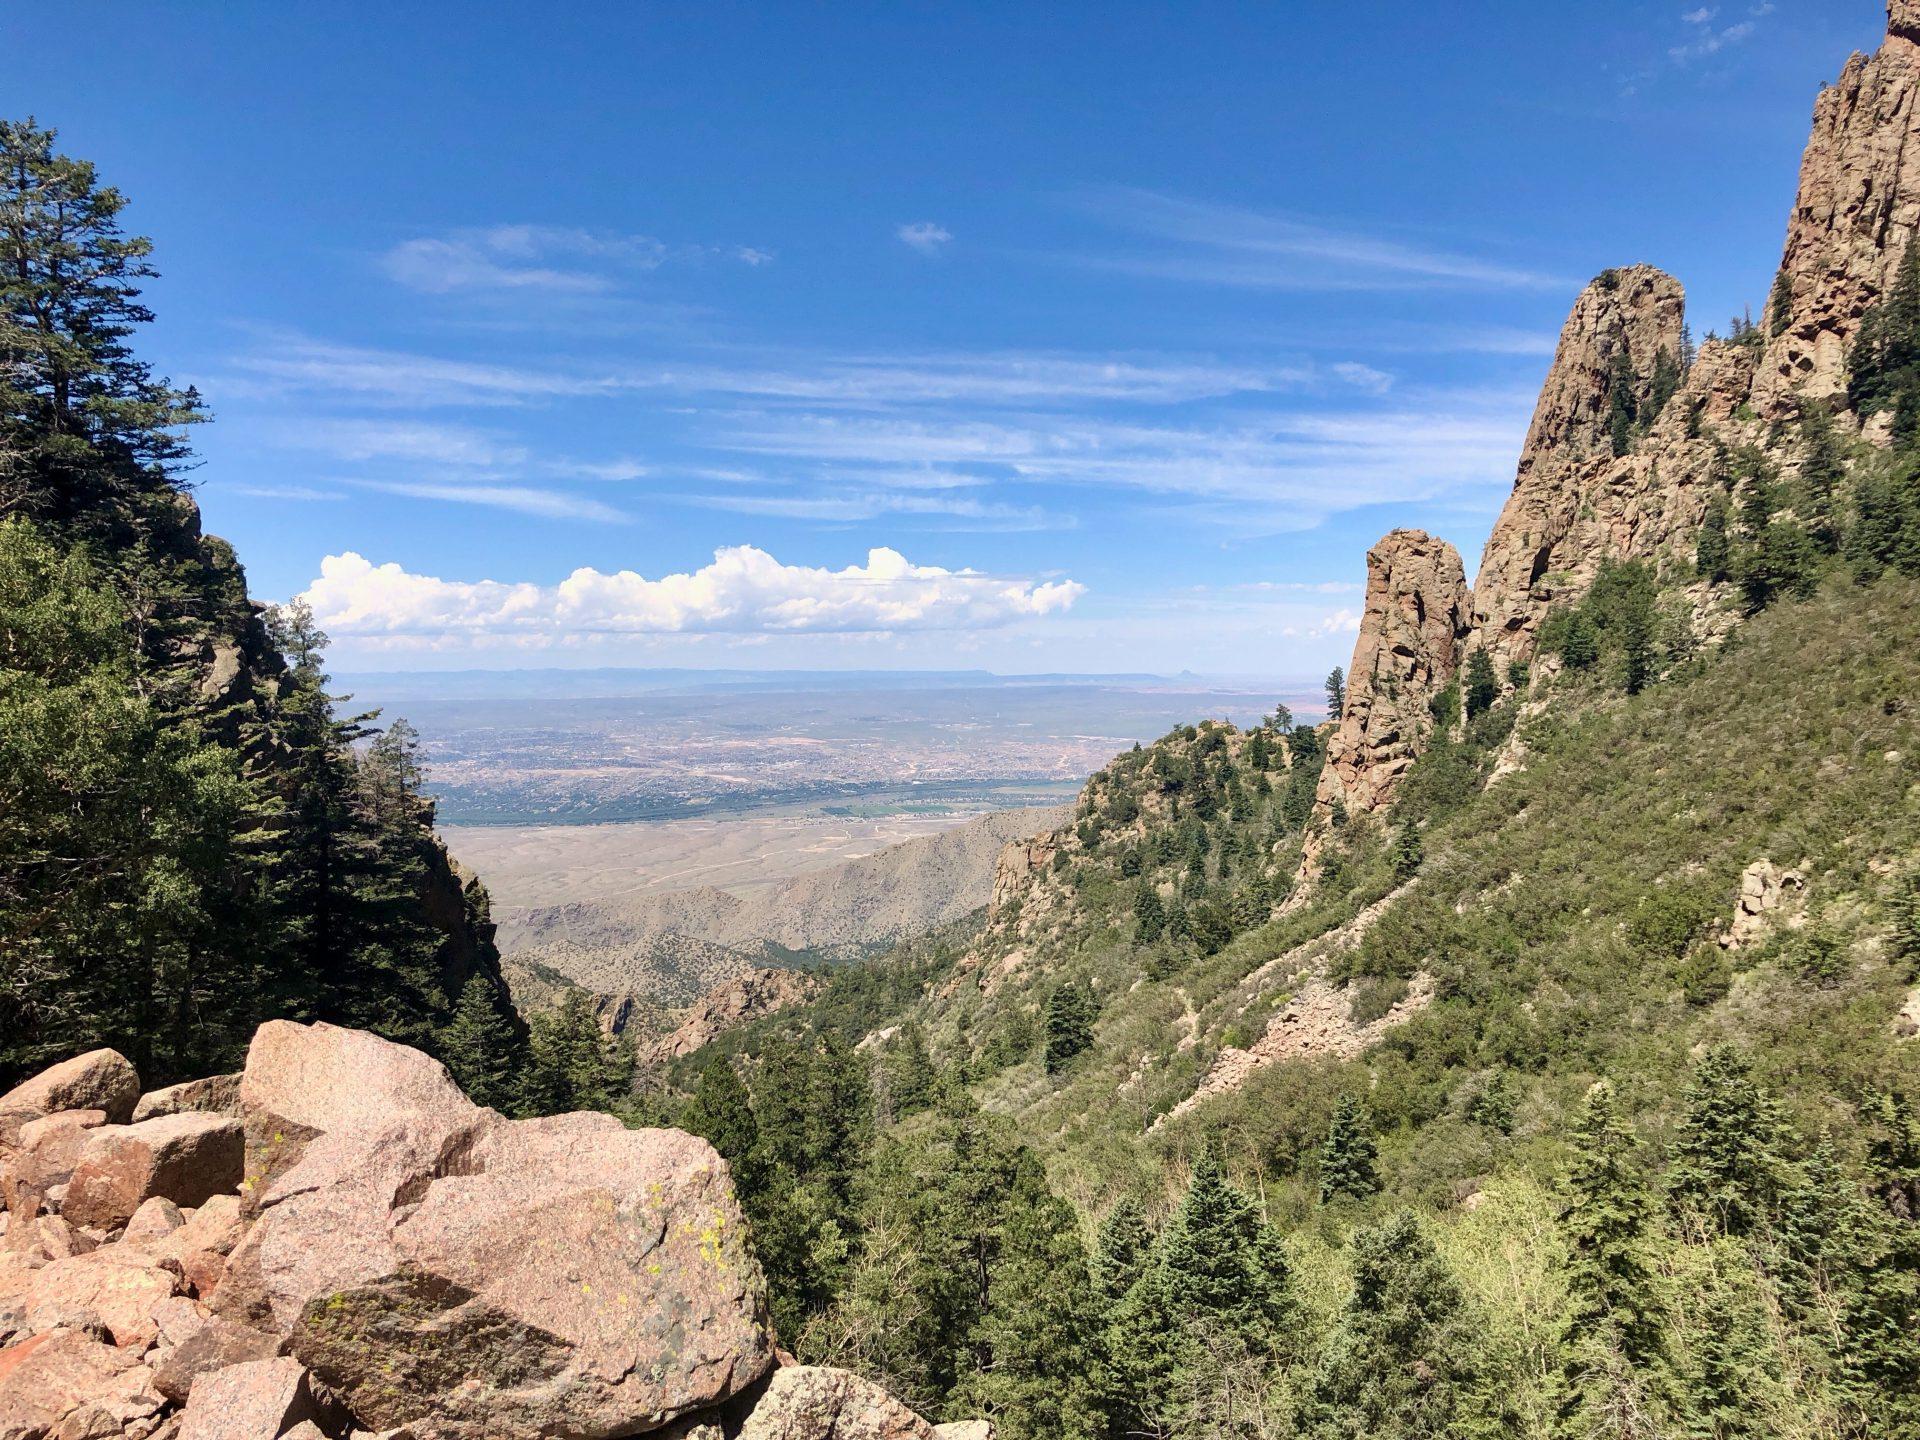 Landscape near Albuquerque NM